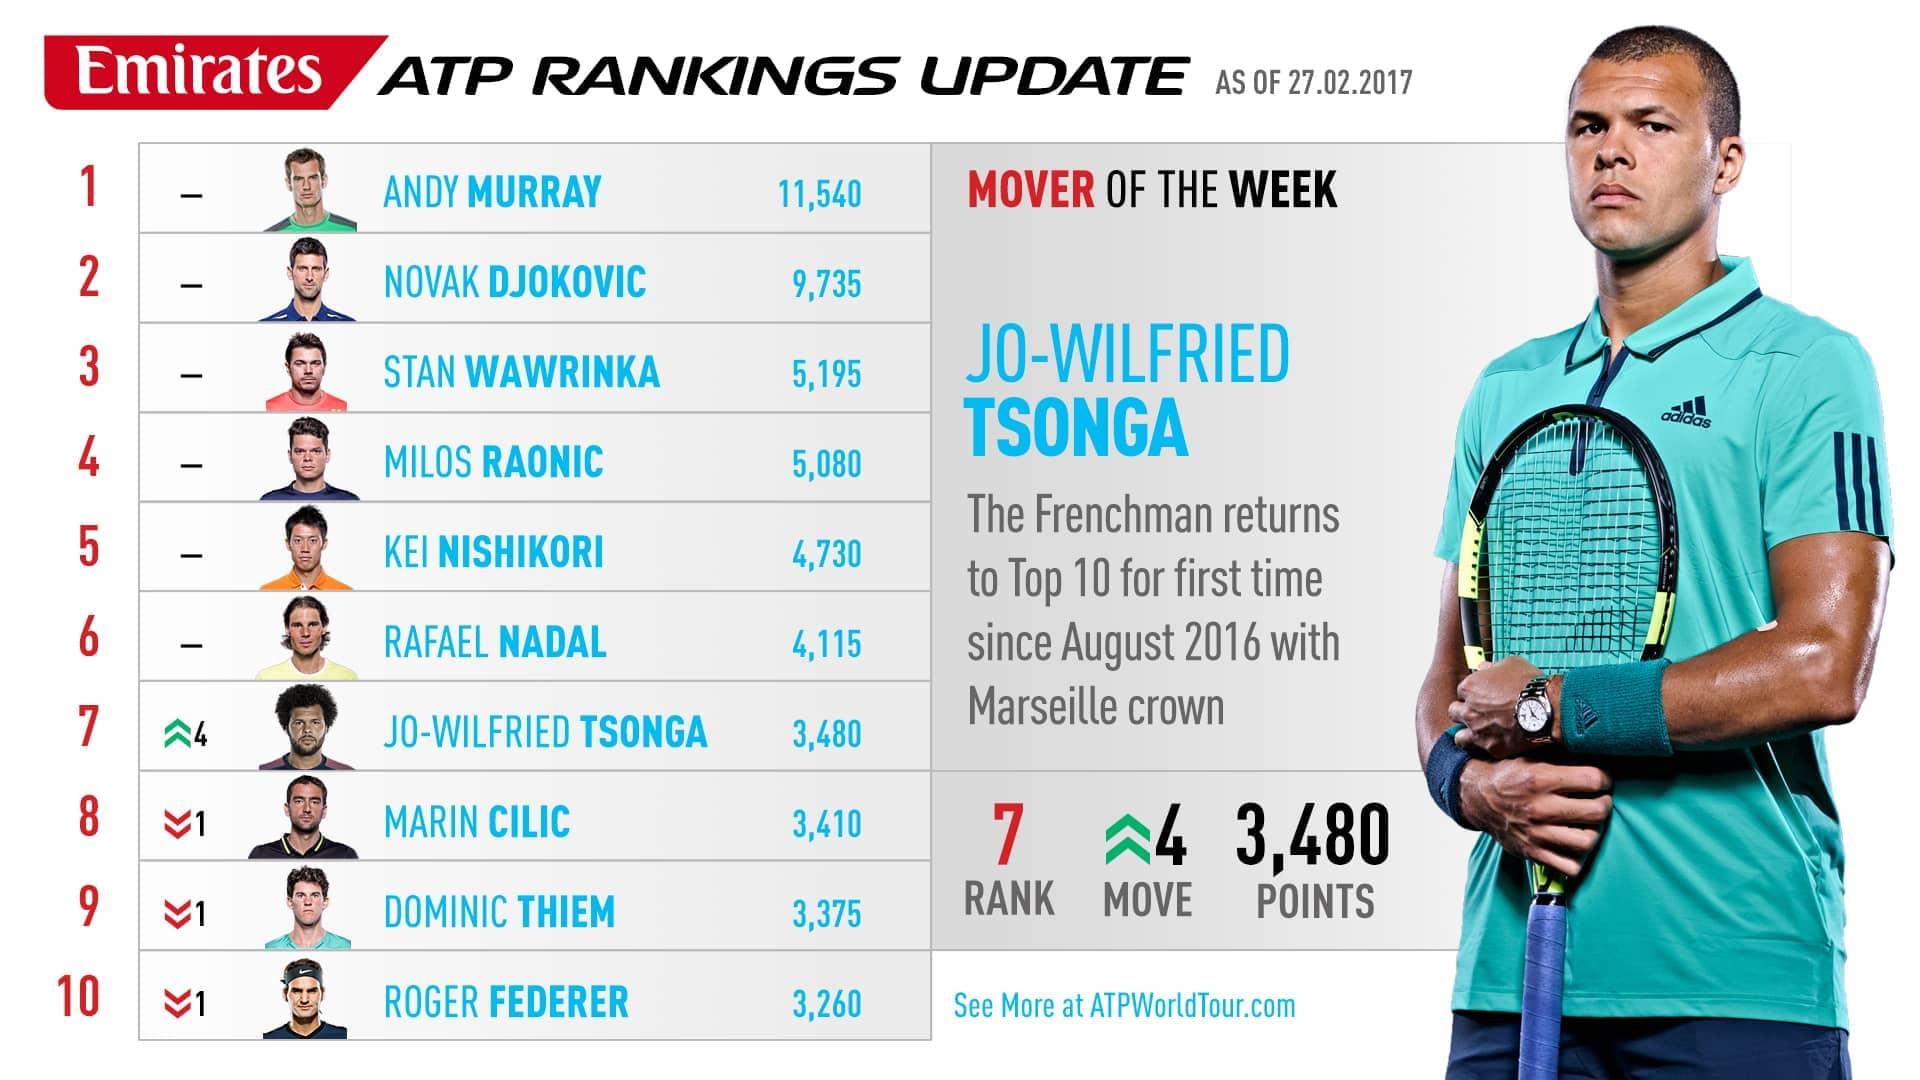 Men S Tennis Atp Rankings Rafael Nadal Moves Up To No 2